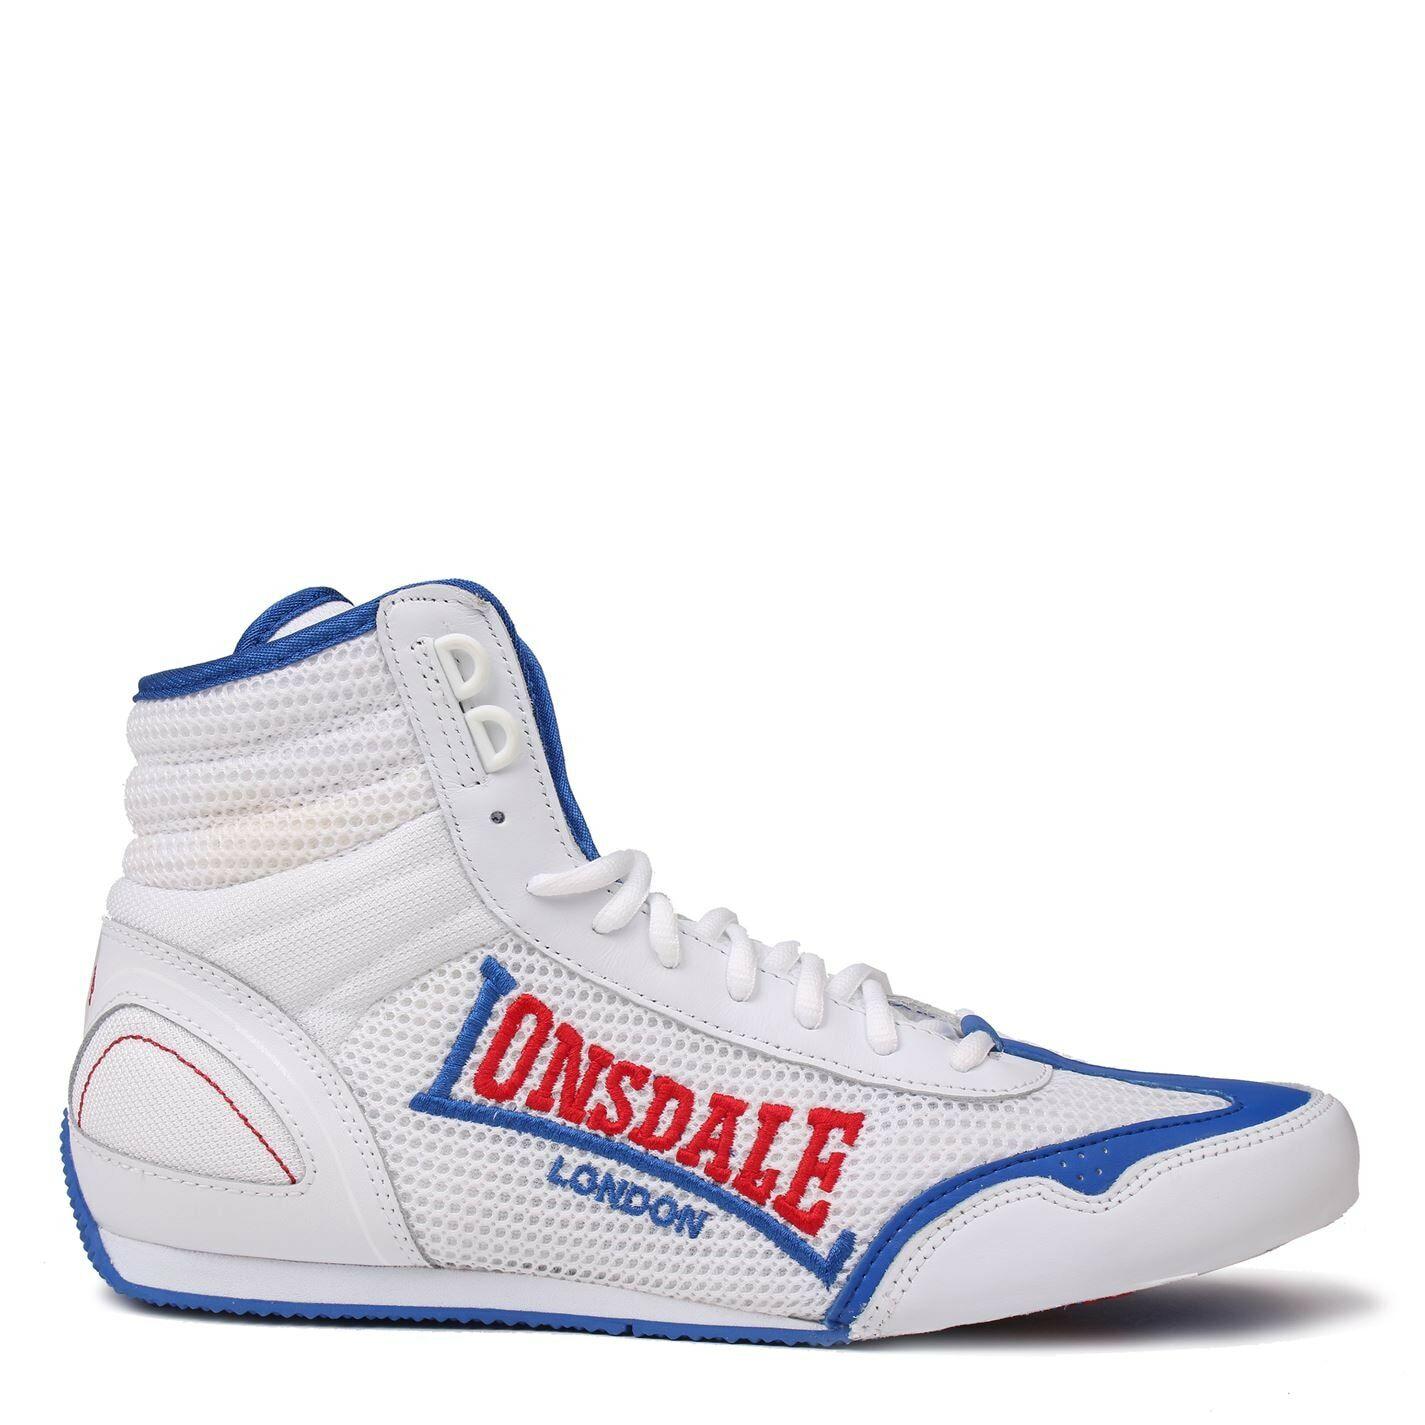 Lonsdale Contender Ανδρικά Παπούτσια Πυγμαχίας